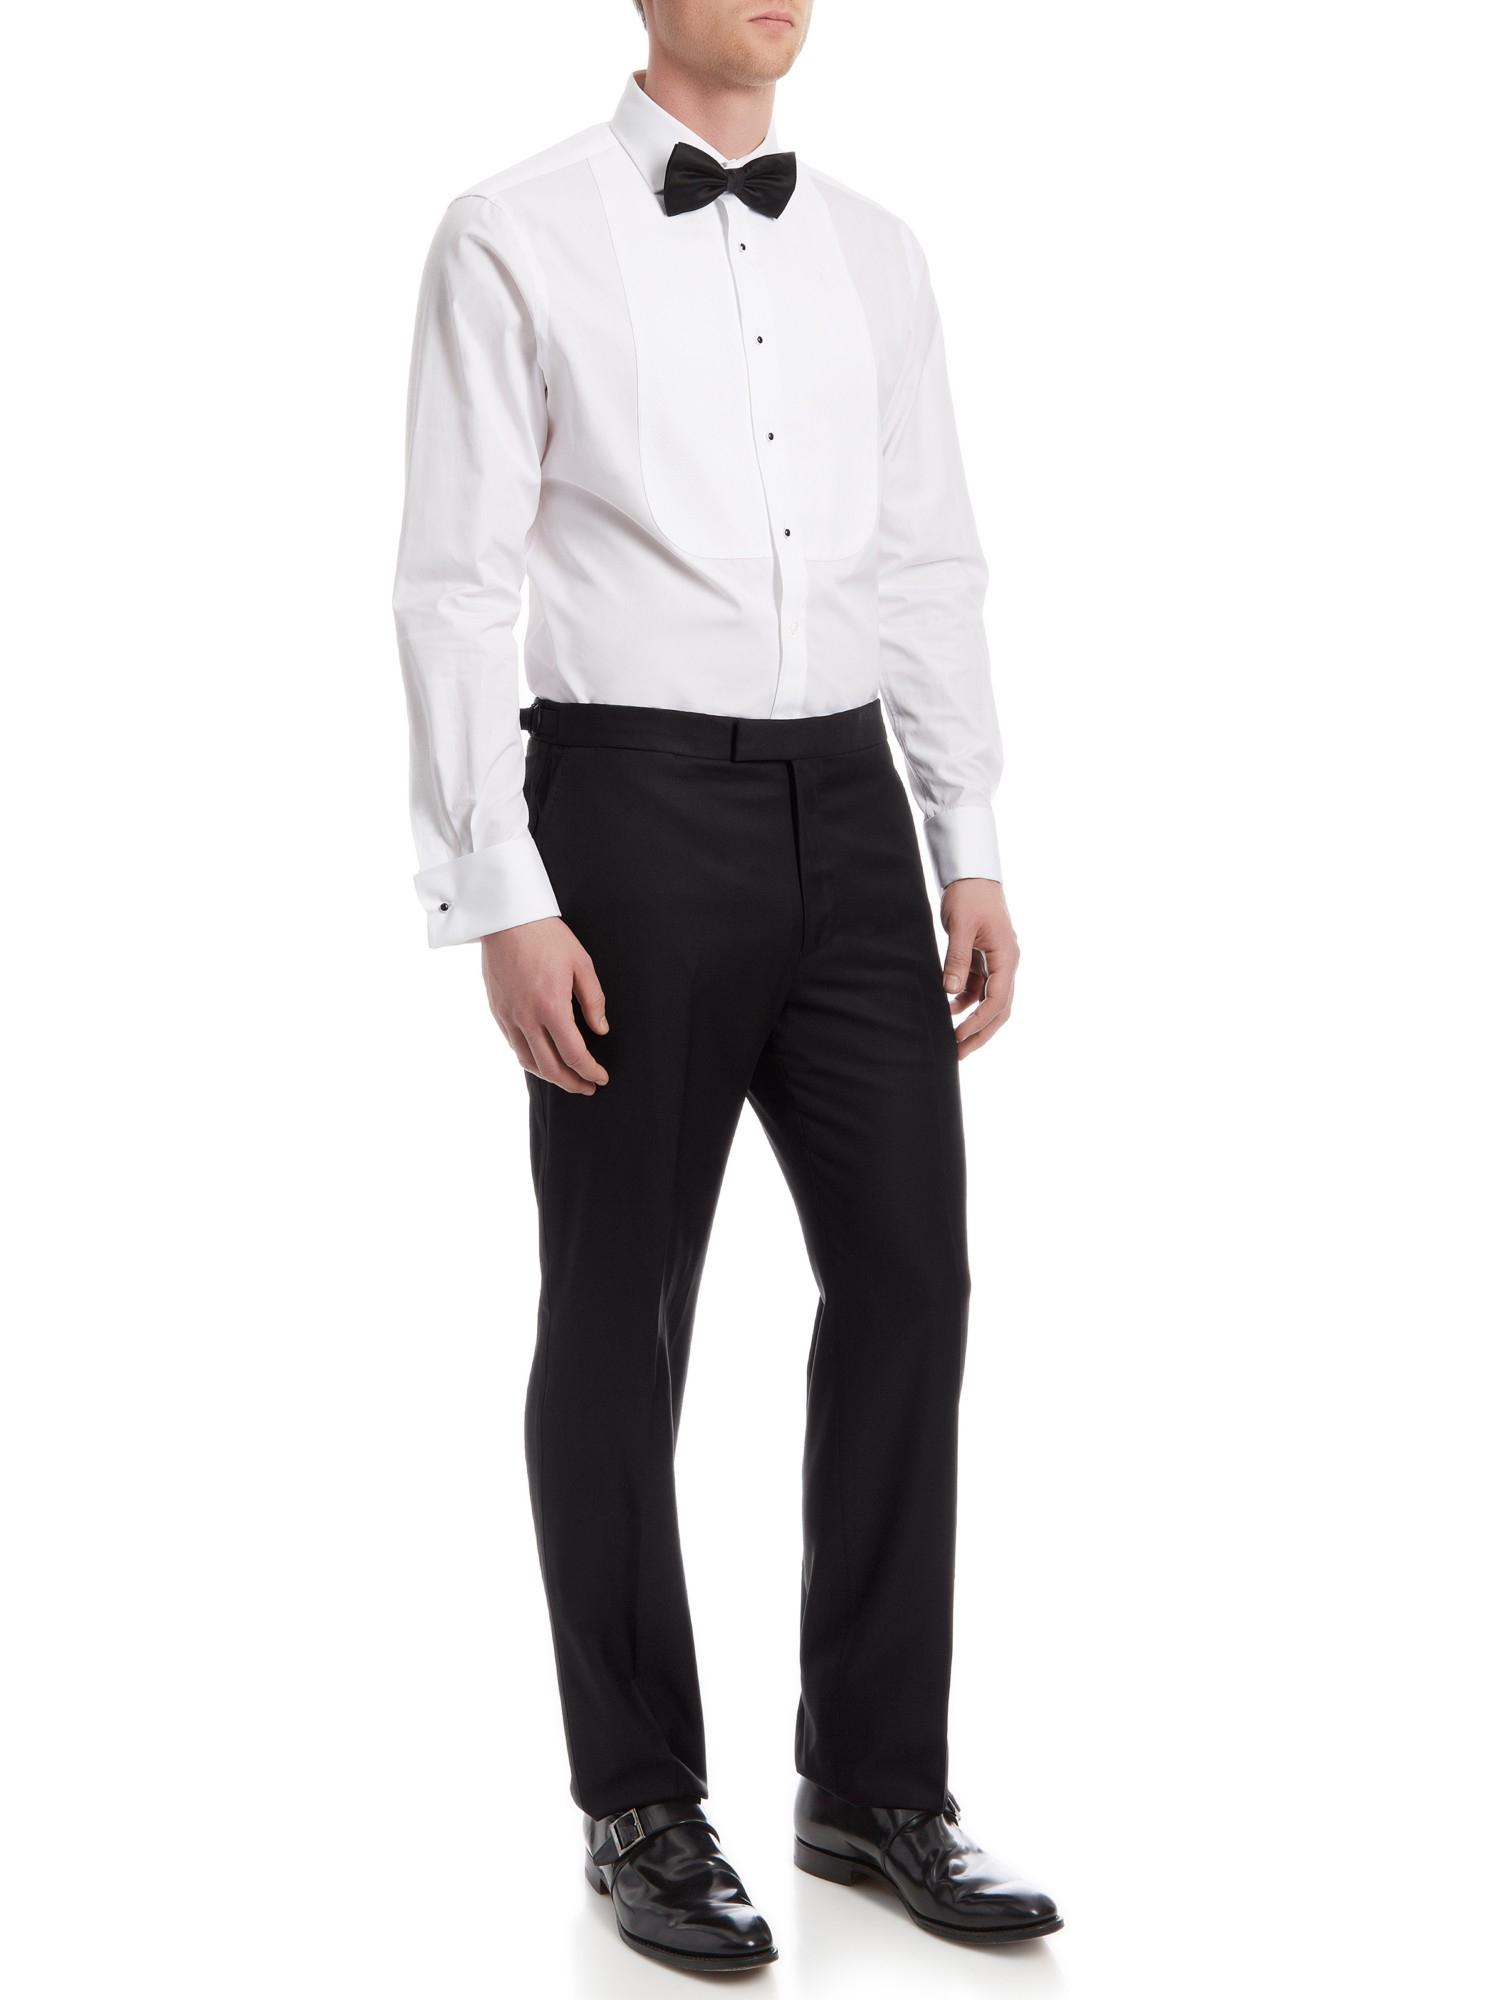 Jaeger Wool Mohair Dinner Suit Trousers in Black for Men